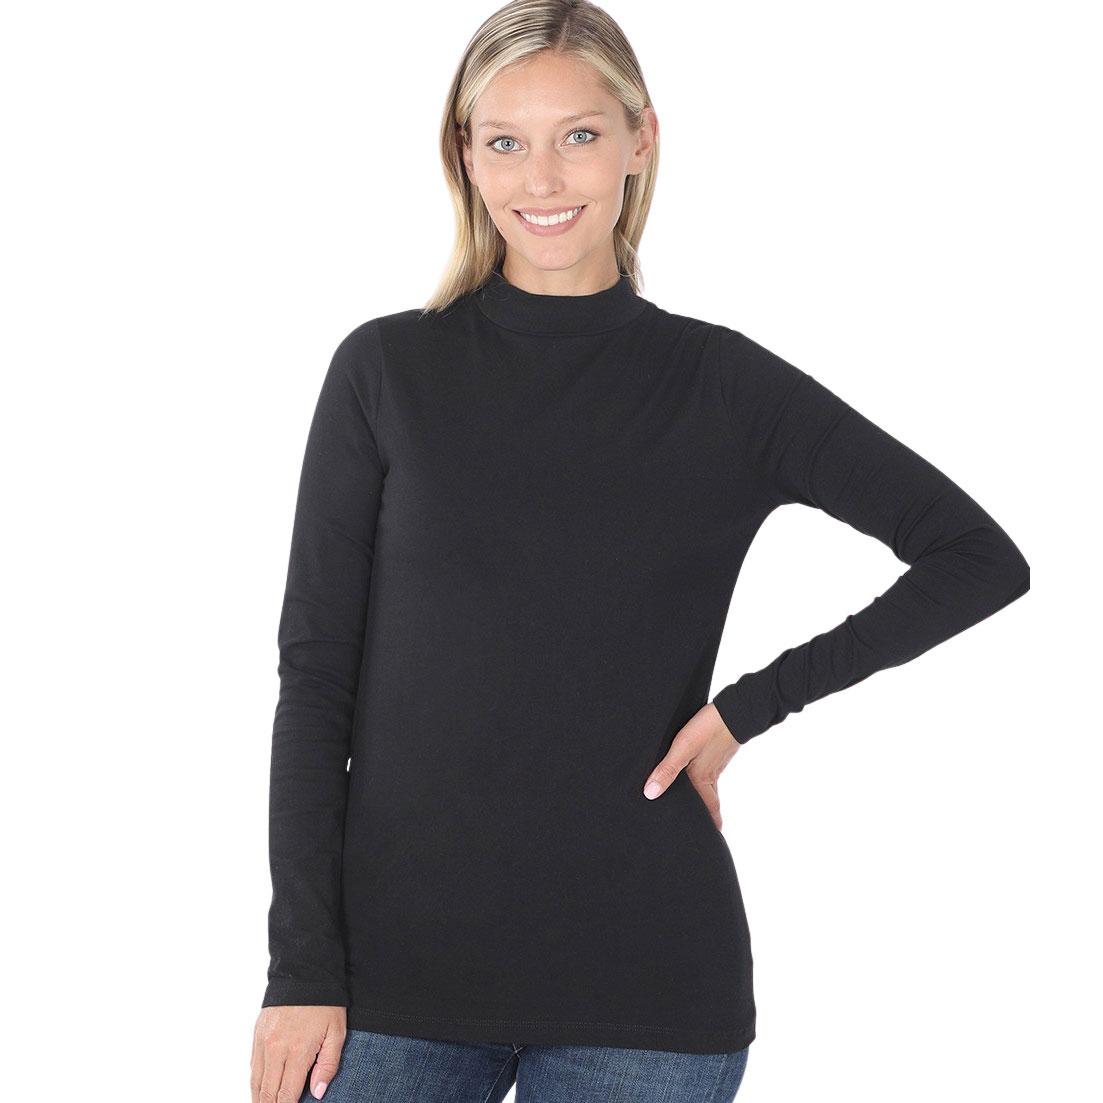 Mock Turtleneck - Cotton Long Sleeve 1059 - Black Mock Turtleneck - Cotton Long Sleeve 1059